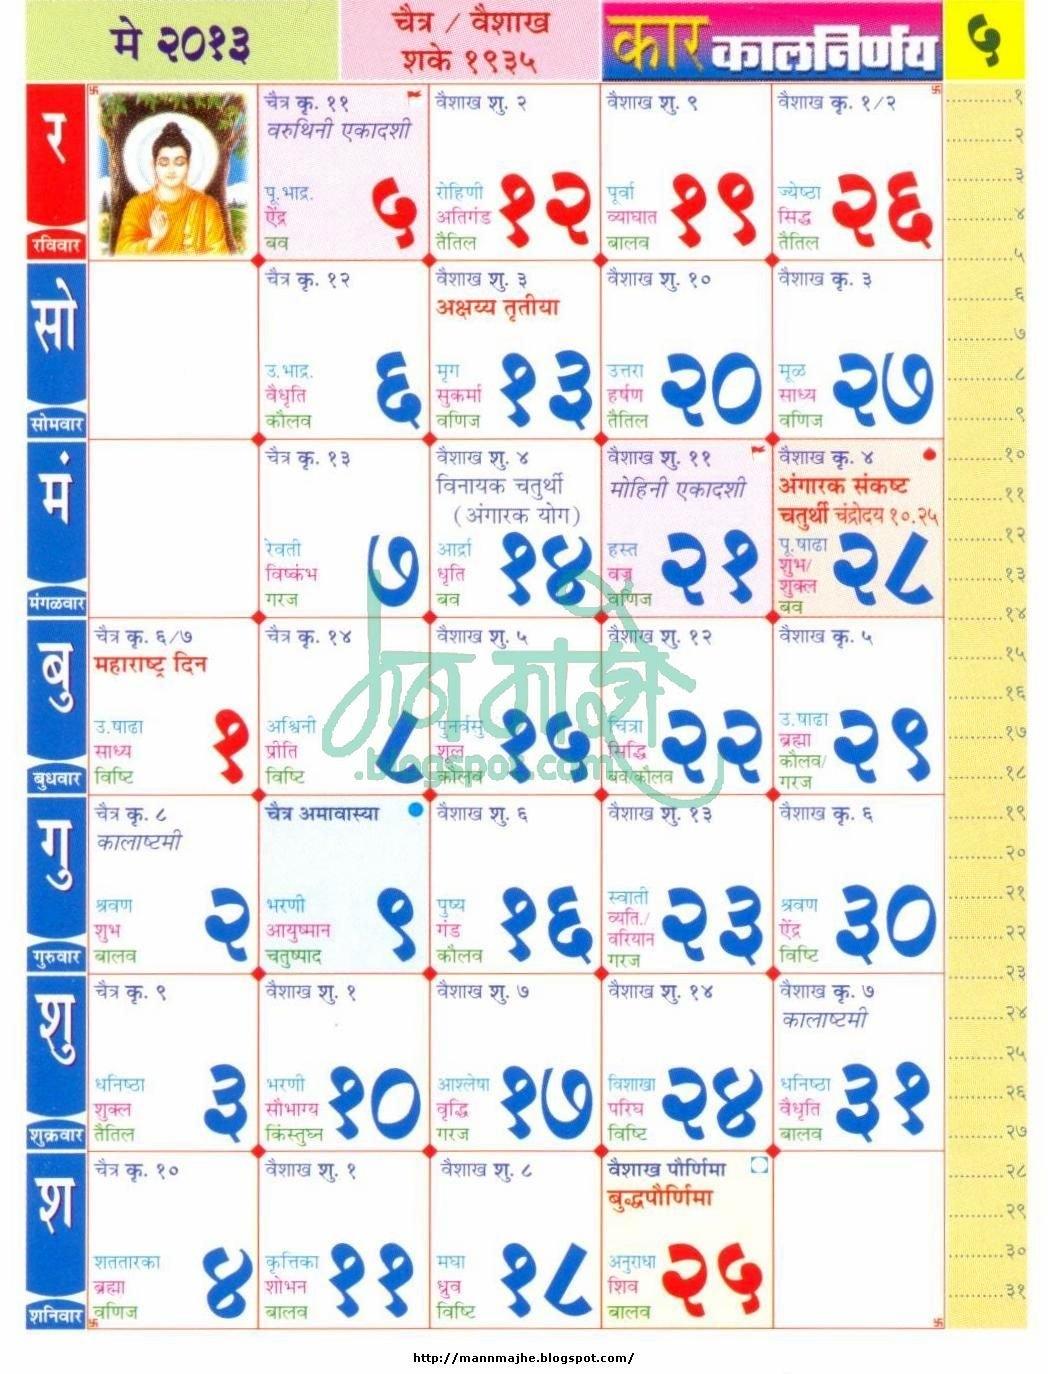 February Kalnirnay 2021 Marathi Calendar Pdf - February 2018 Kalnirnay Calendar In Marathi And for Kalnirnay 2021 Marathi Calendar